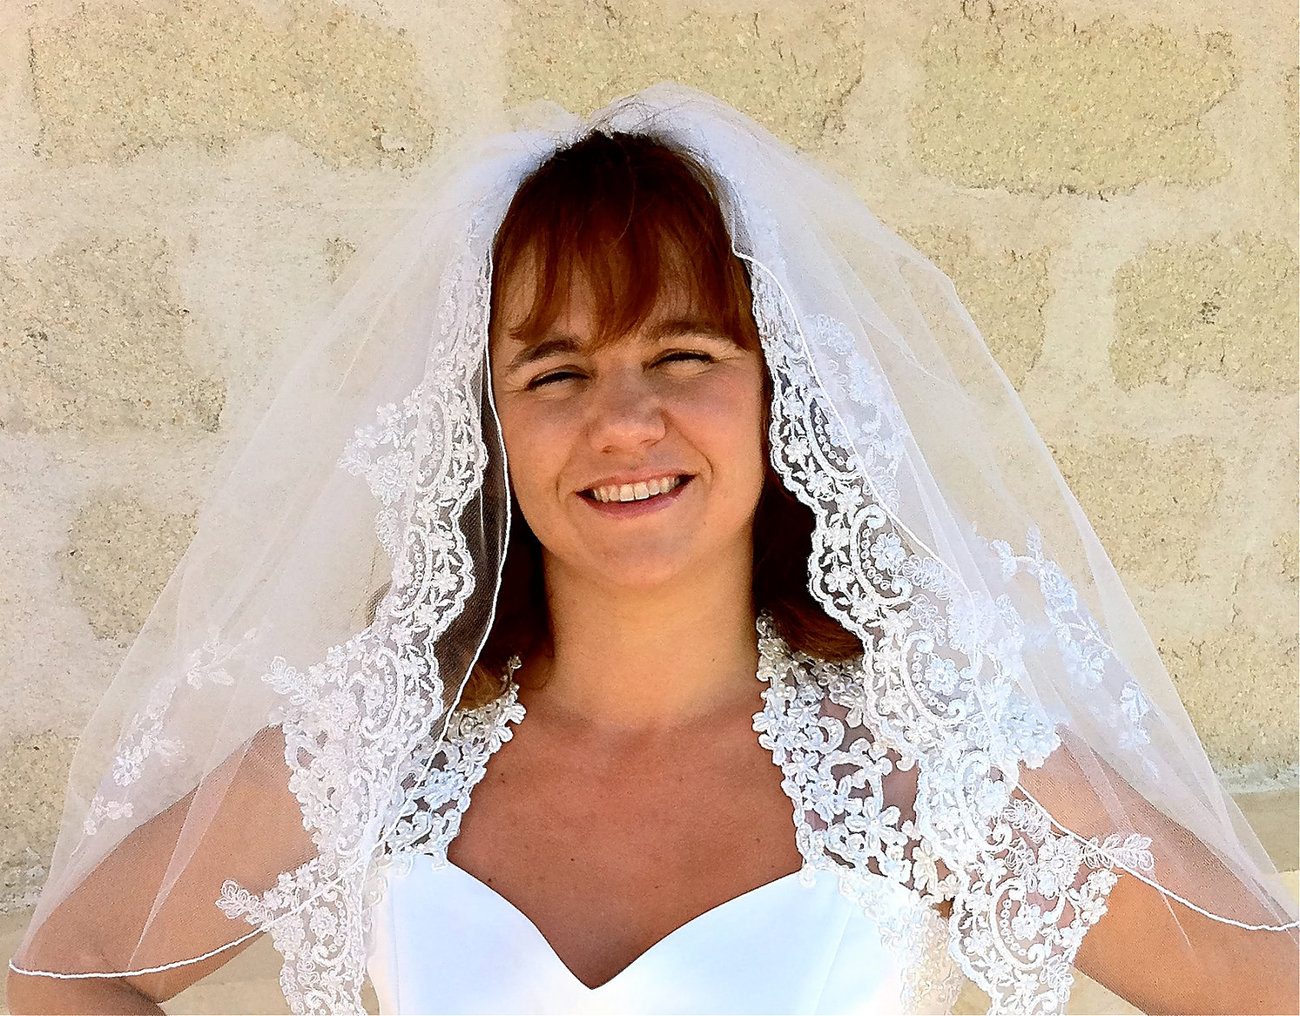 Bridal Veils - 2  Tier lace veil with gorgeous appliqués and curly edge top l